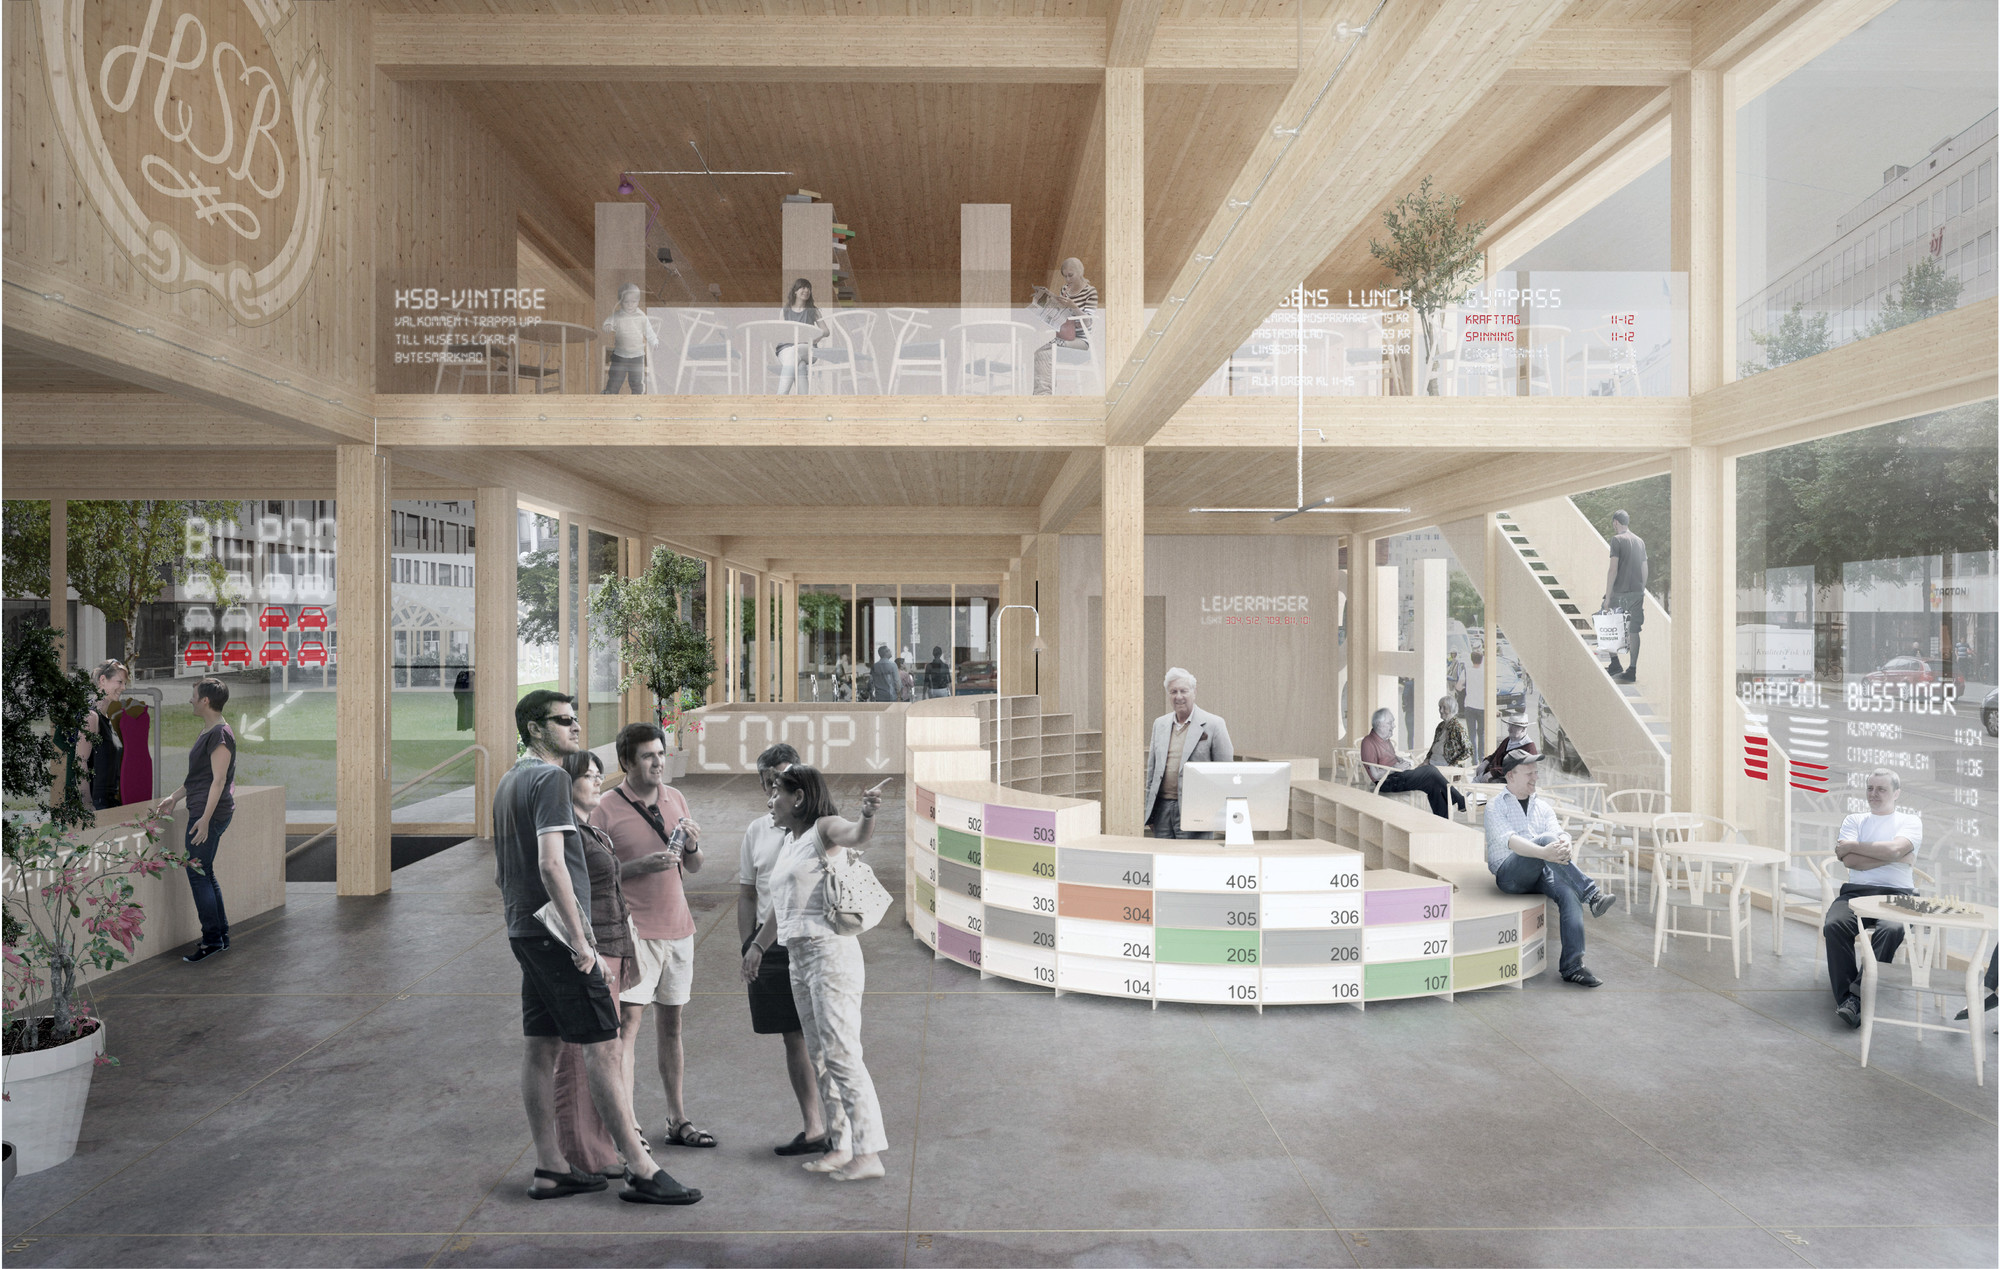 C.F. Møller And DinnellJohanssonu0027s Wooden Skyscraper Wins International  Competition,Fleminggatan 4: View Of Communal